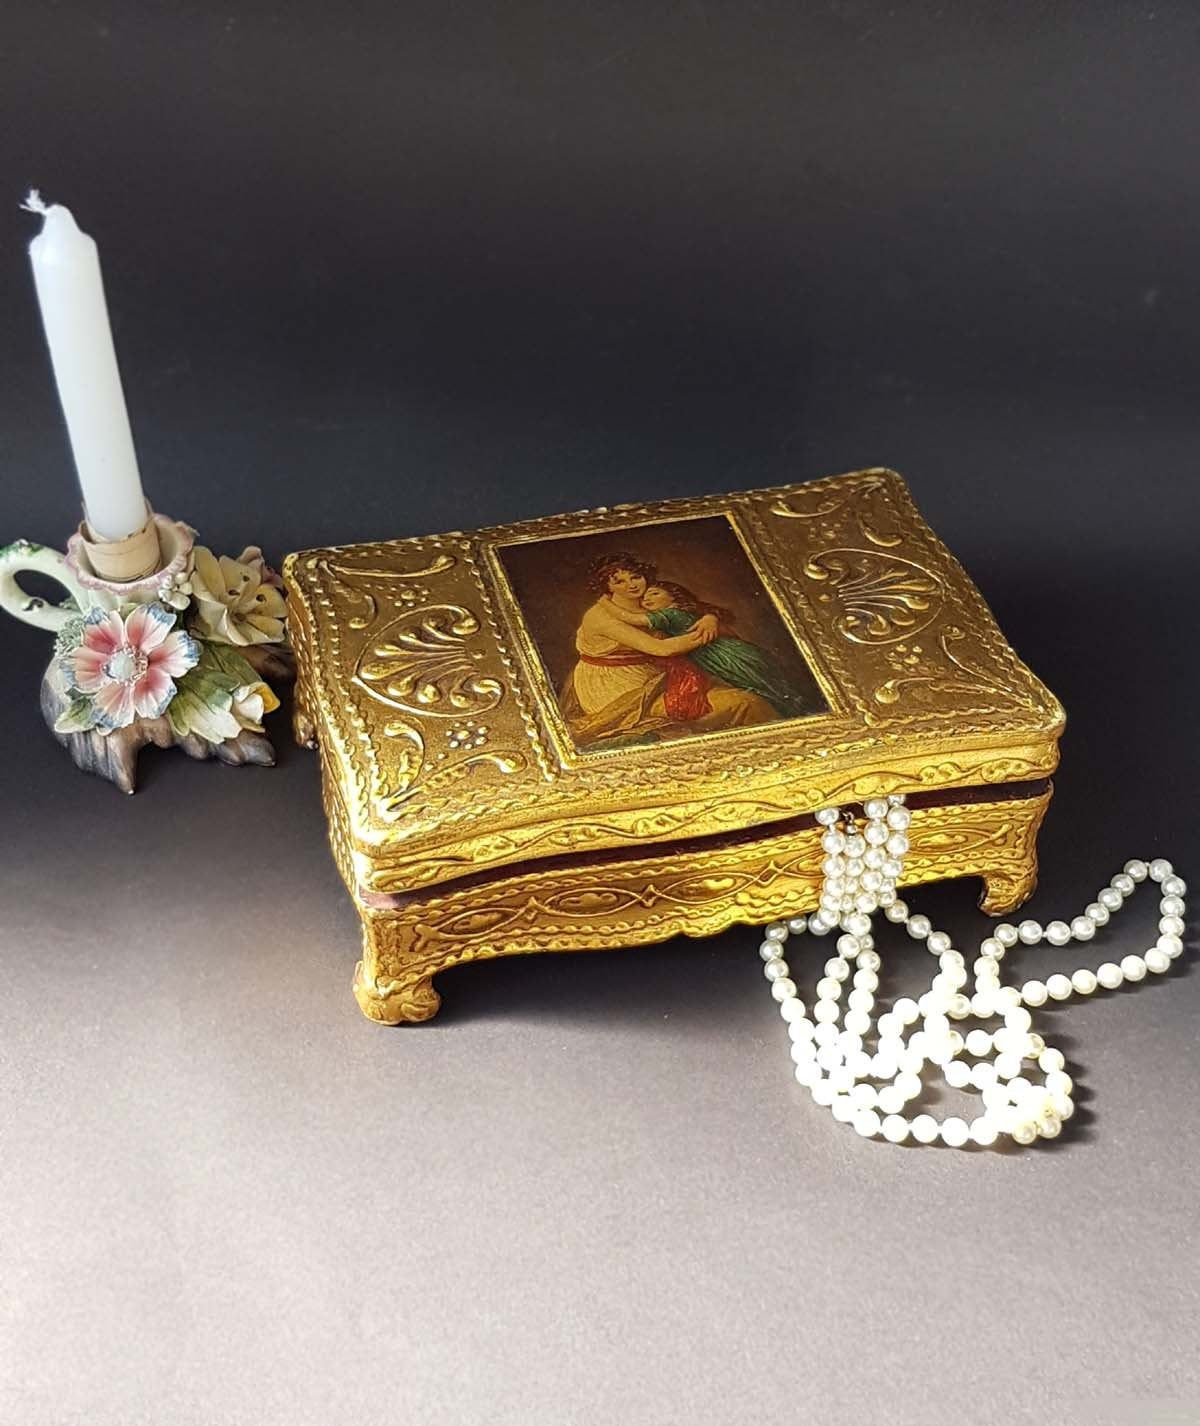 Vintage Gold and White Italian Florentine Trinket Box  Jewelry Box  Hollywood Regency  Home Decor